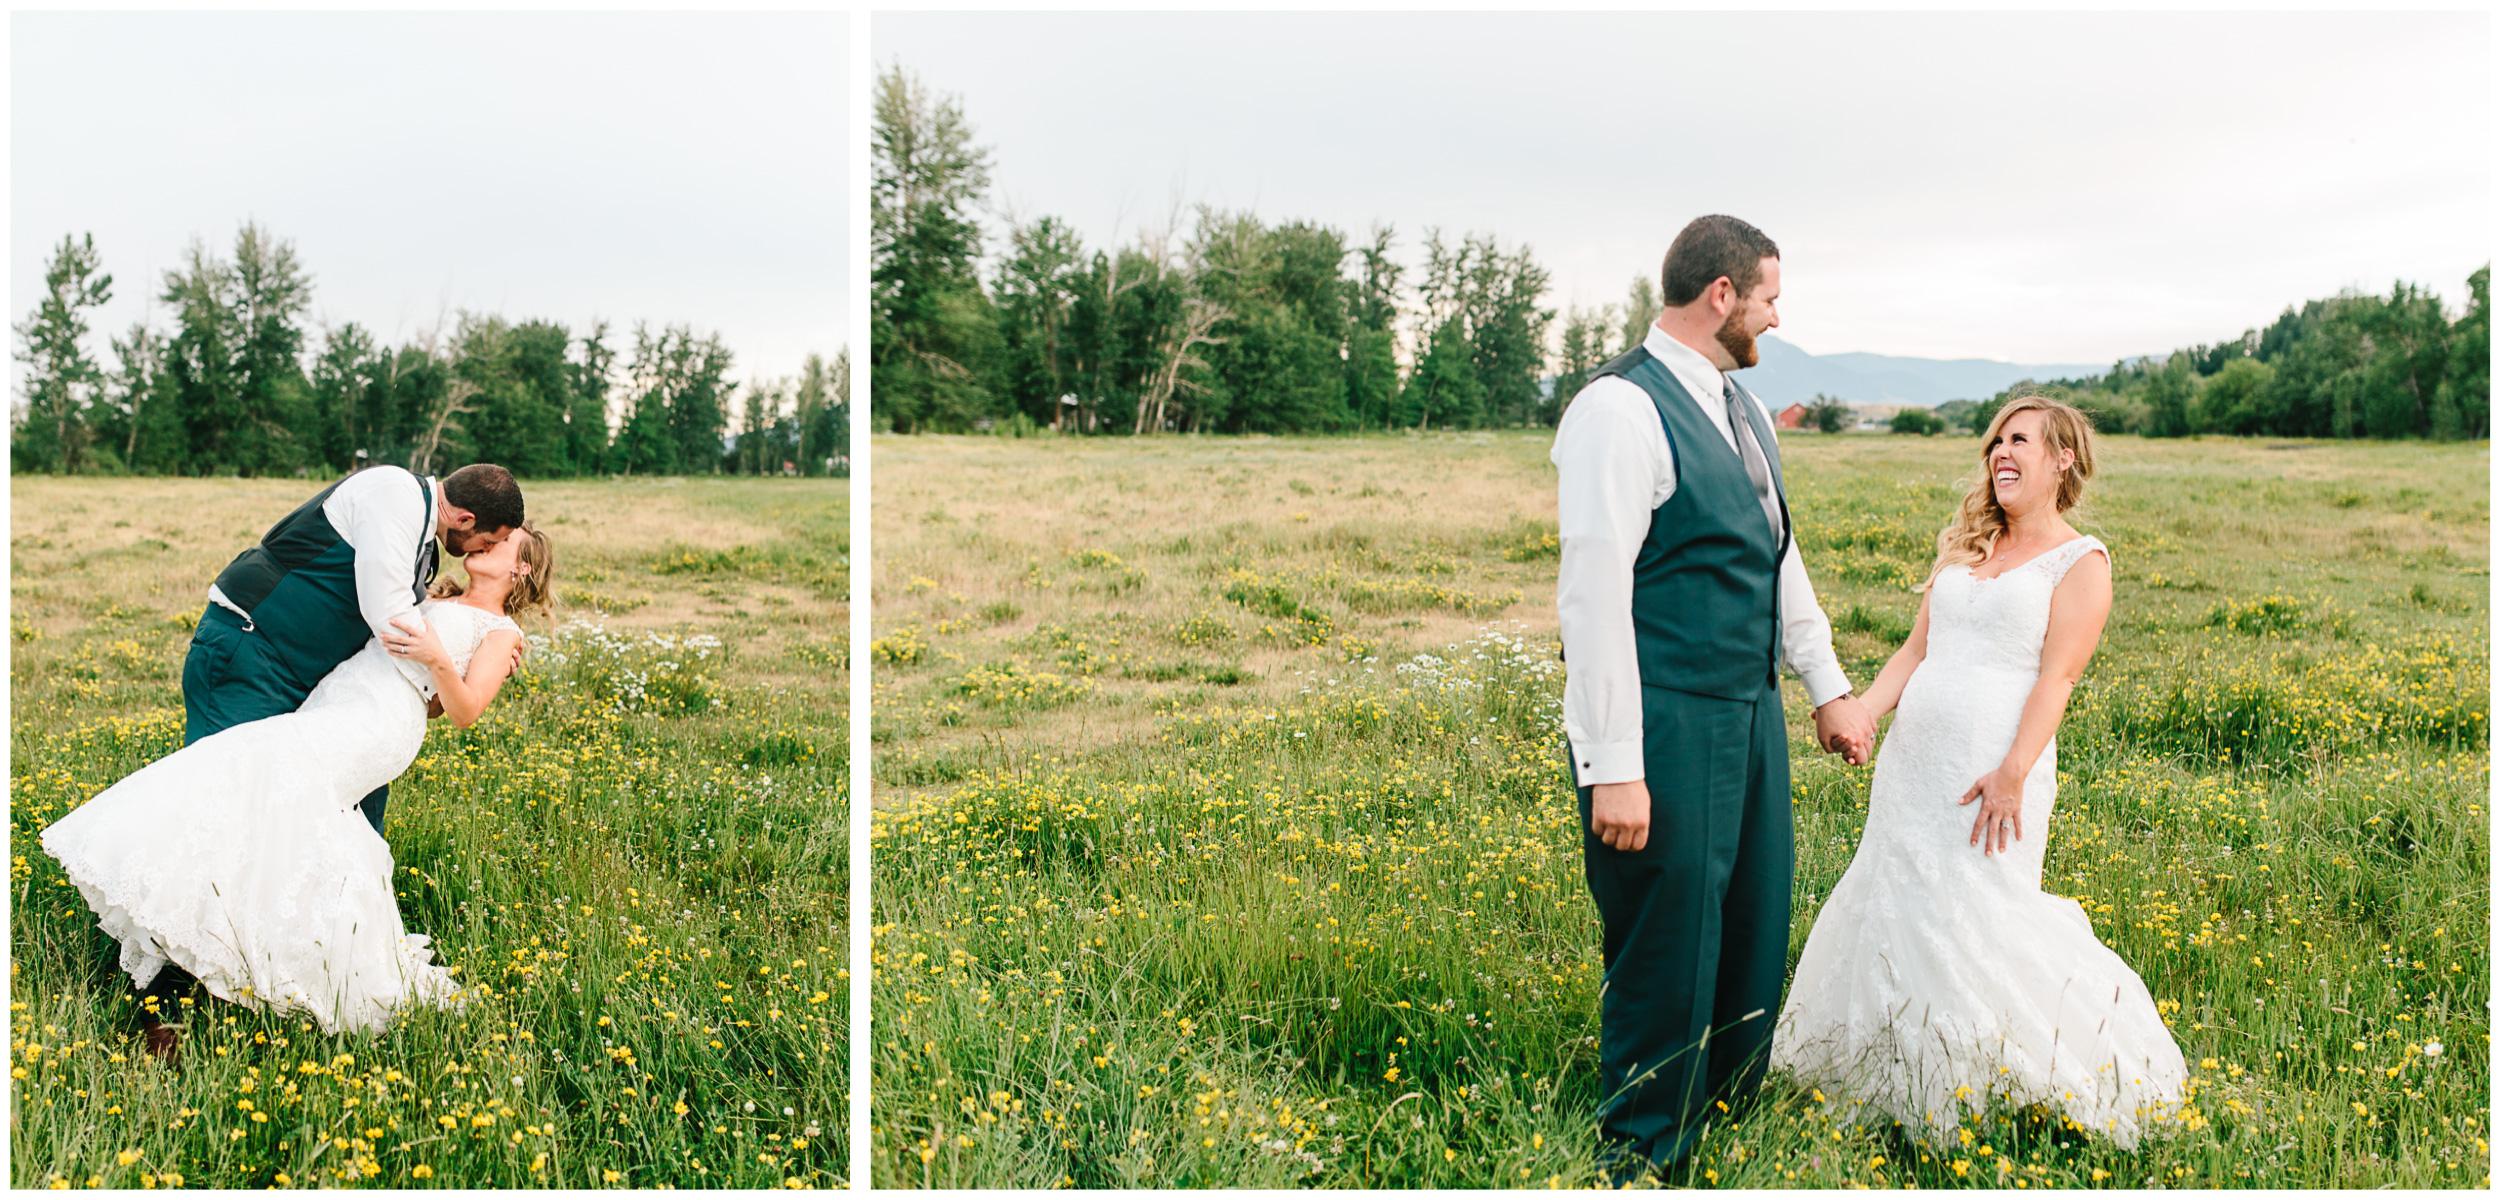 redlodge_montana_wedding_39.jpg